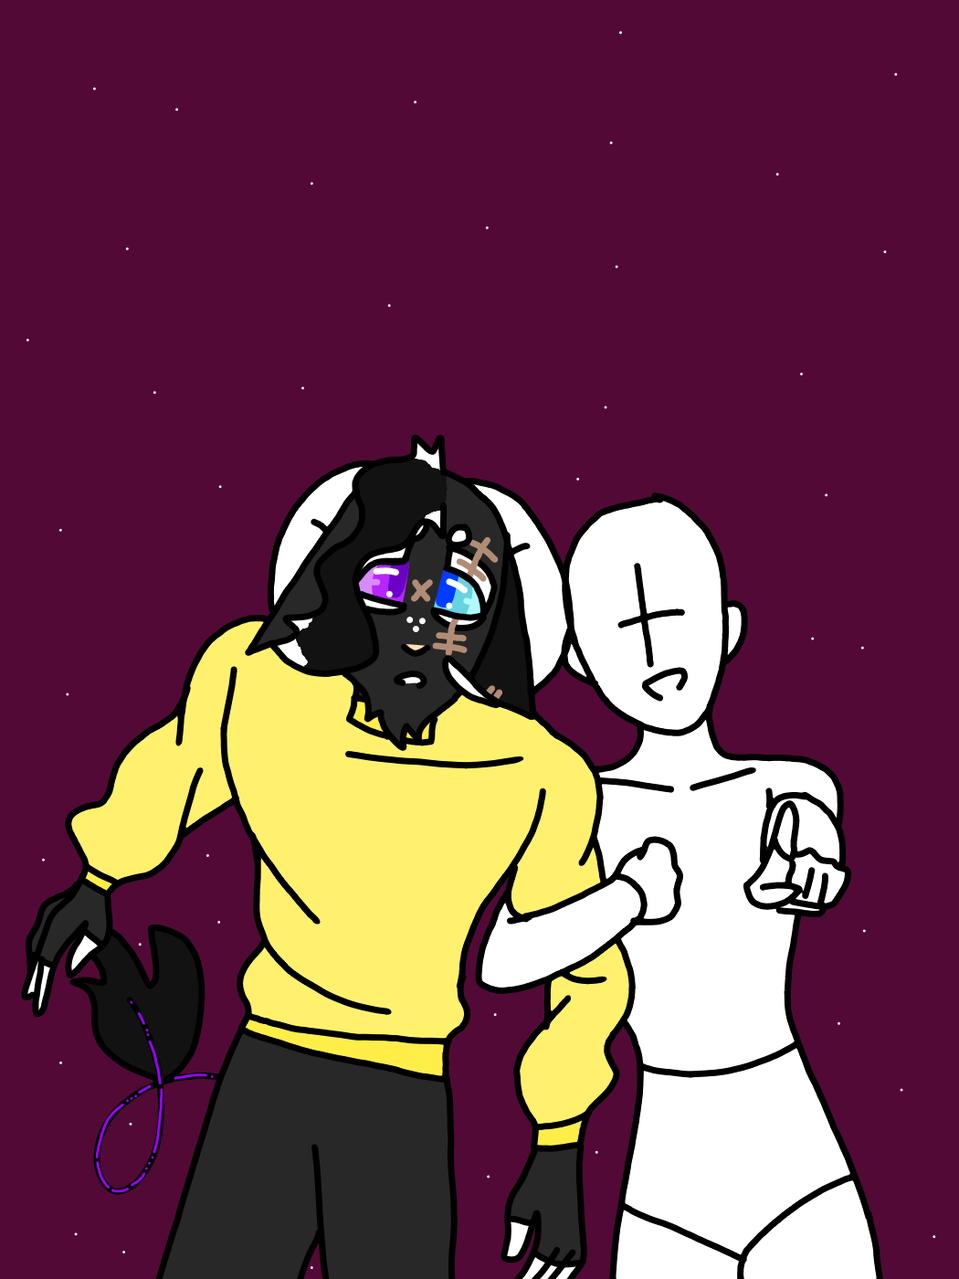 Collab anyone? Illust of HeadHonchoCodex medibangpaint boy HeadHonchoCodex dark villain sweater oc Emo collab furry